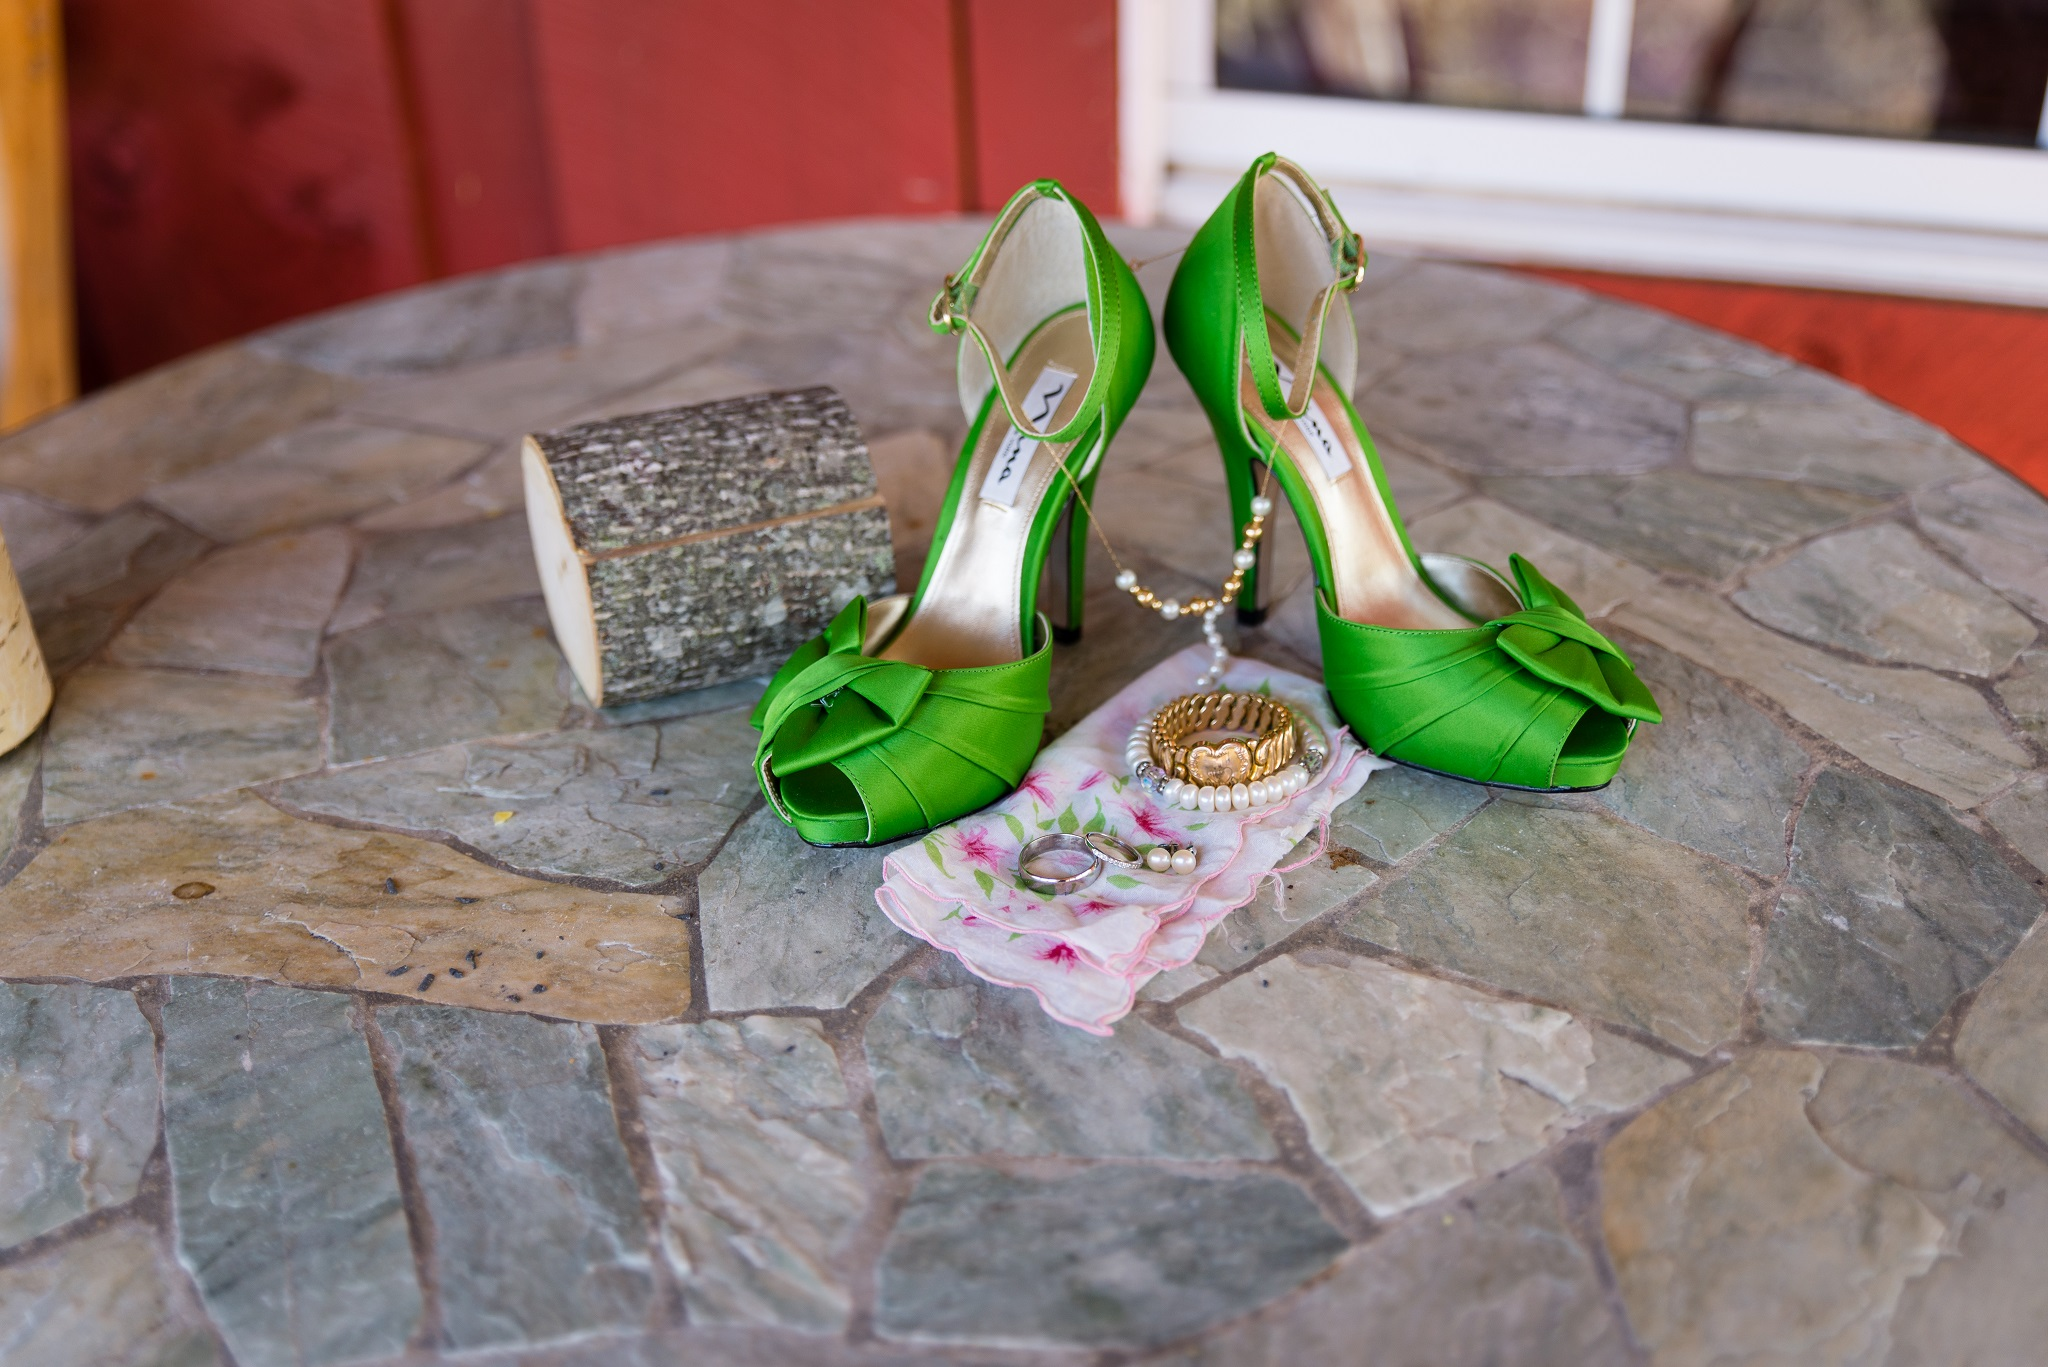 wedding rings, details, Campton KY wedding, rrg wedding, Red River Gorge, outdoor wedding, kentucky wedding, ky wedding photographer